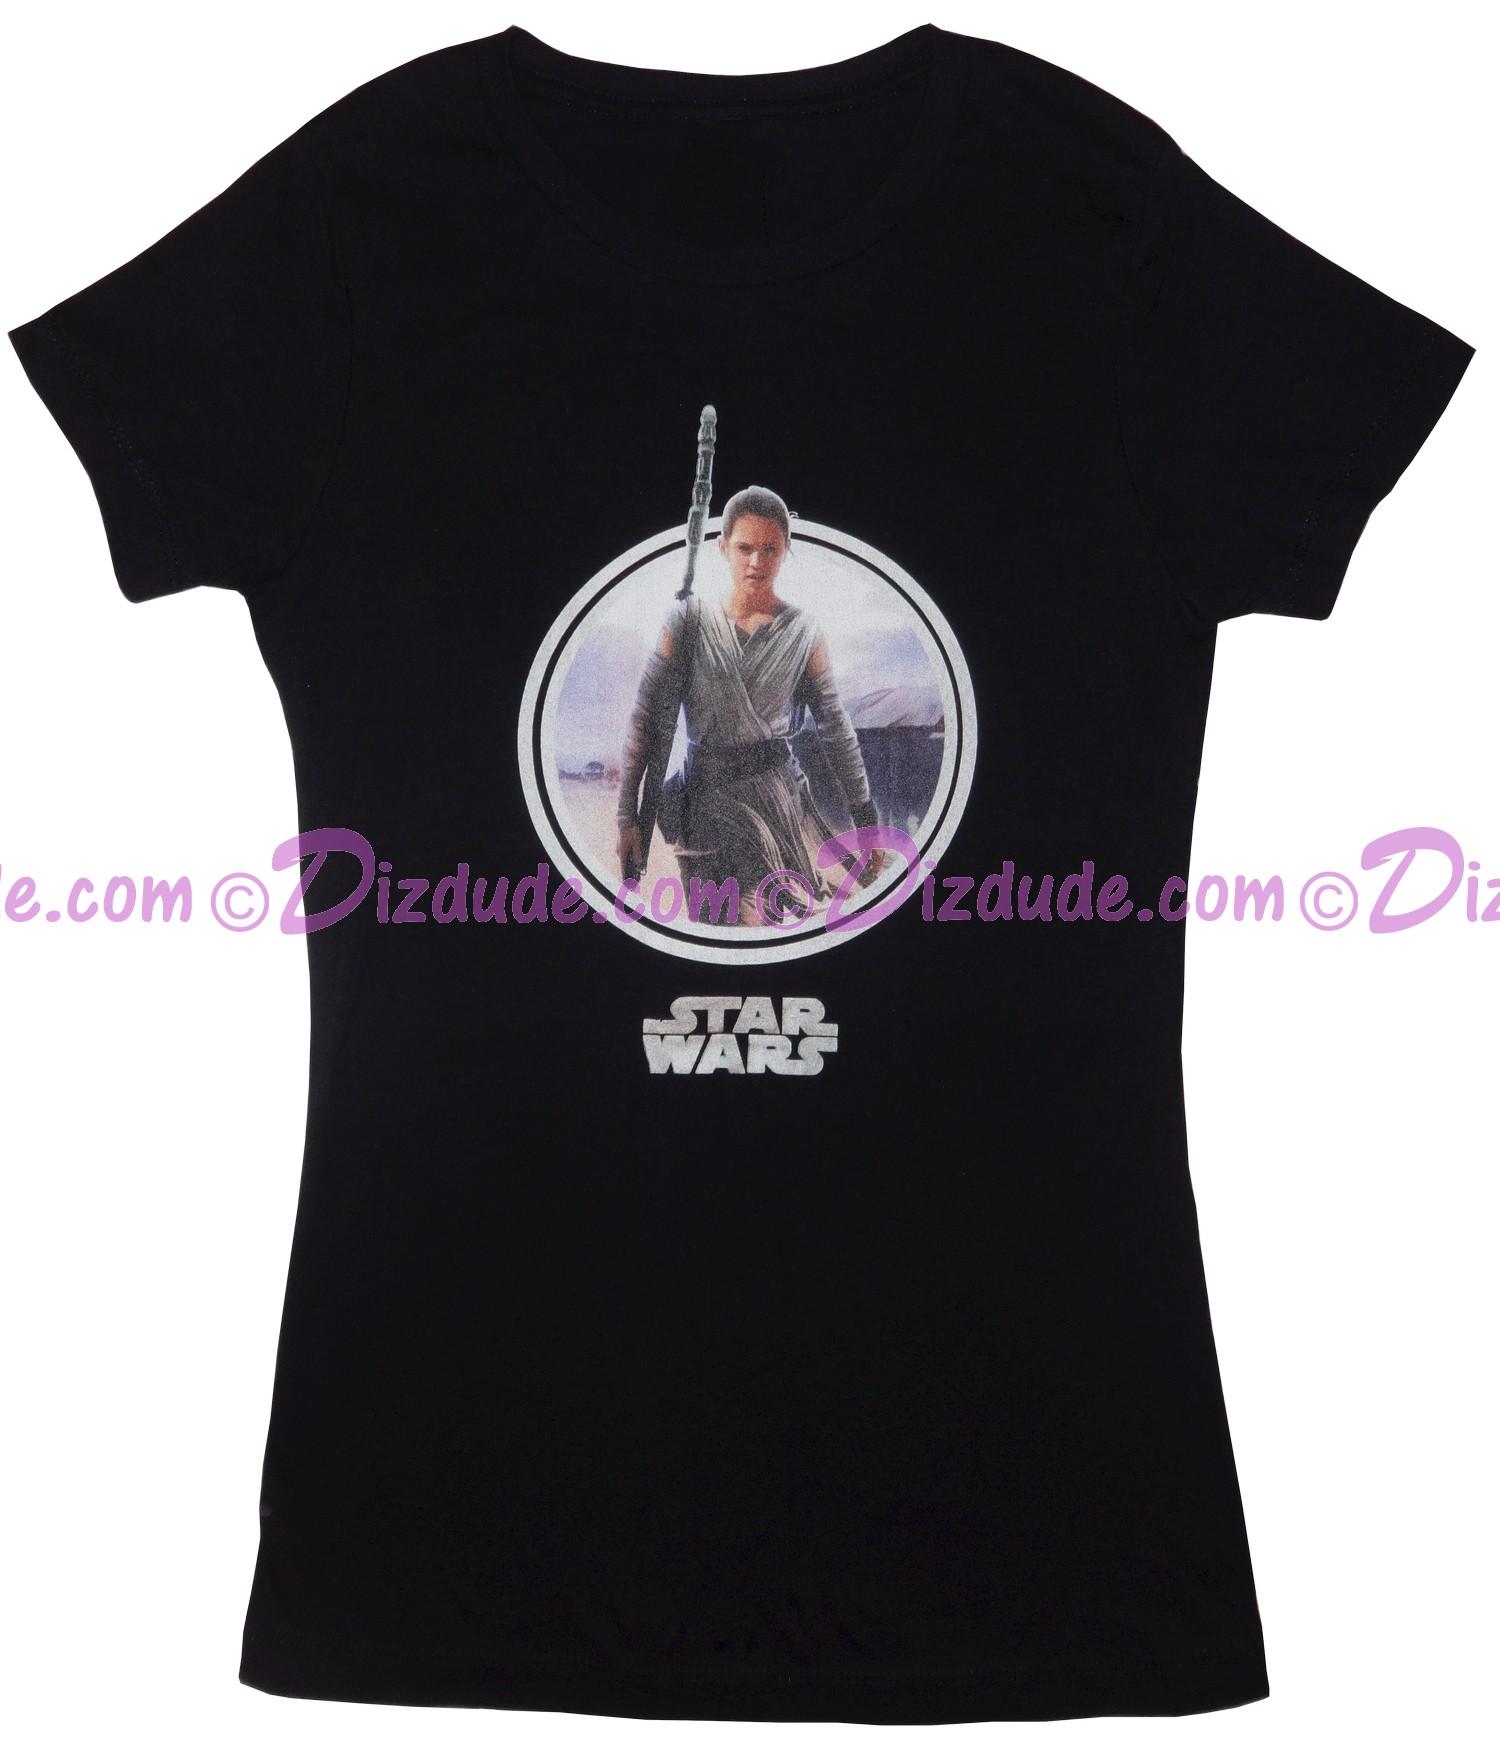 Vintage Rey Ladies T-Shirt (Tshirt, T shirt or Tee) Star Wars The Force Awakens © Dizdude.com